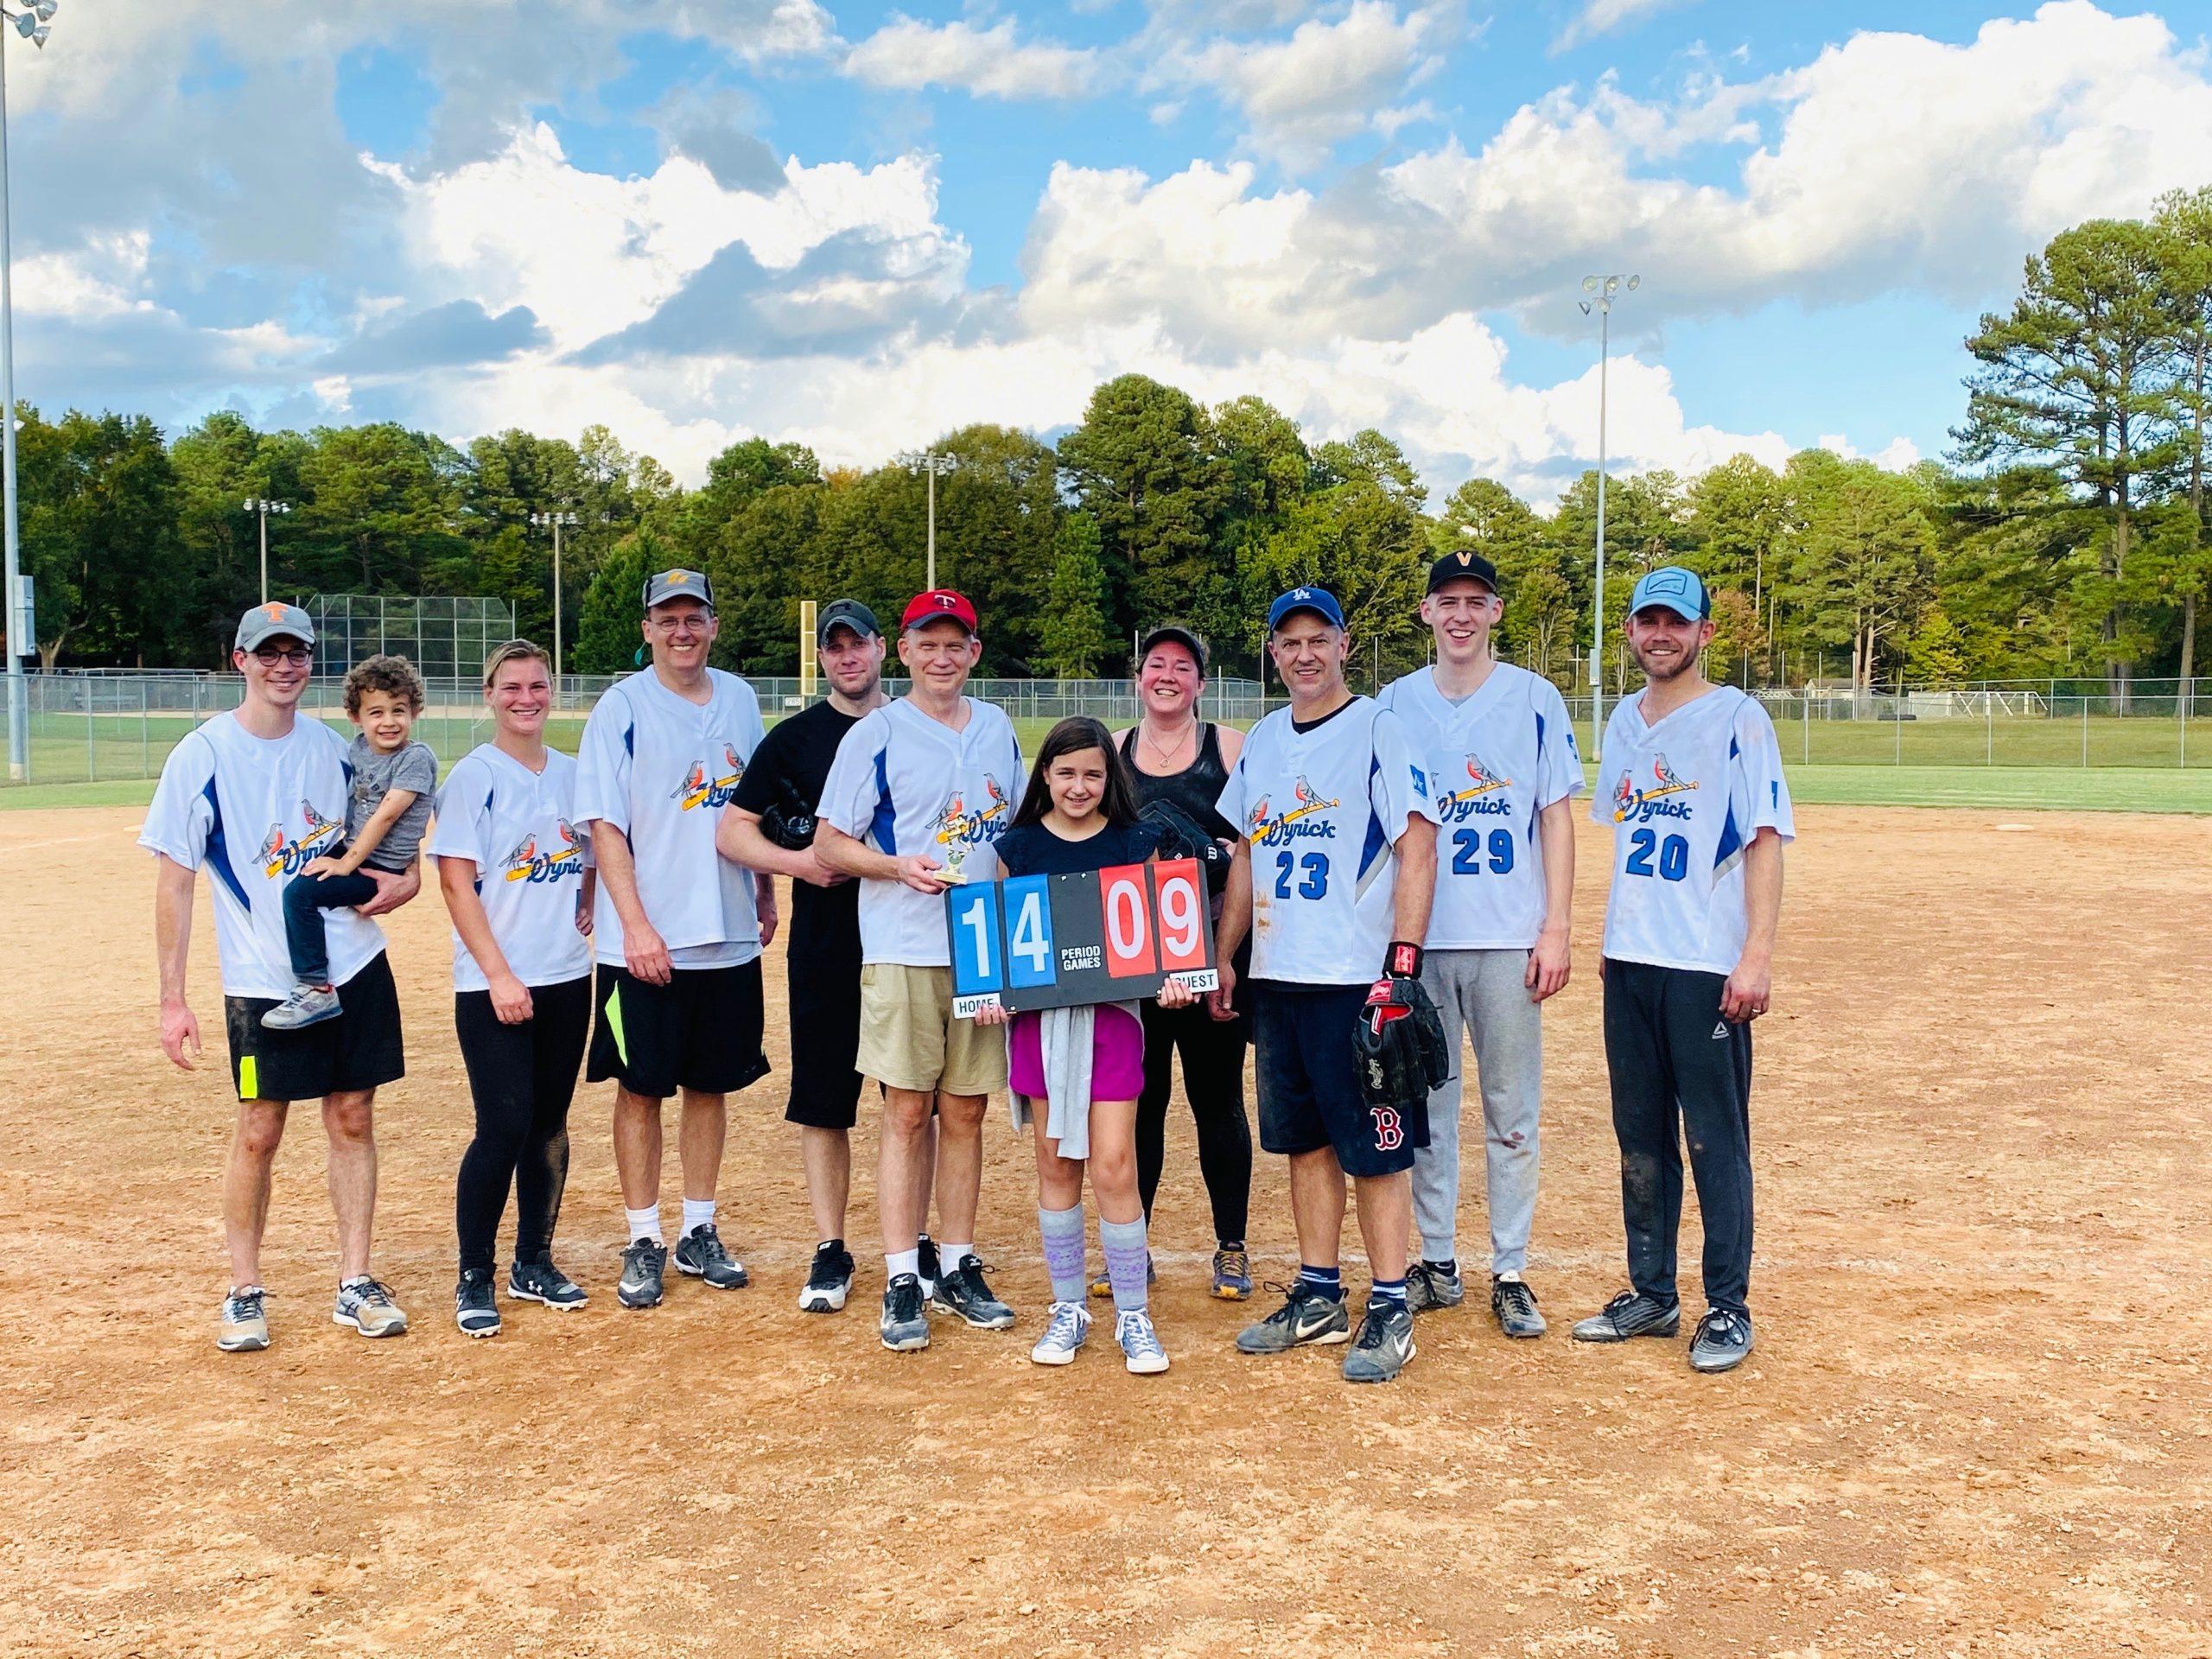 Wyrick Robbins 2019 Softball Champions